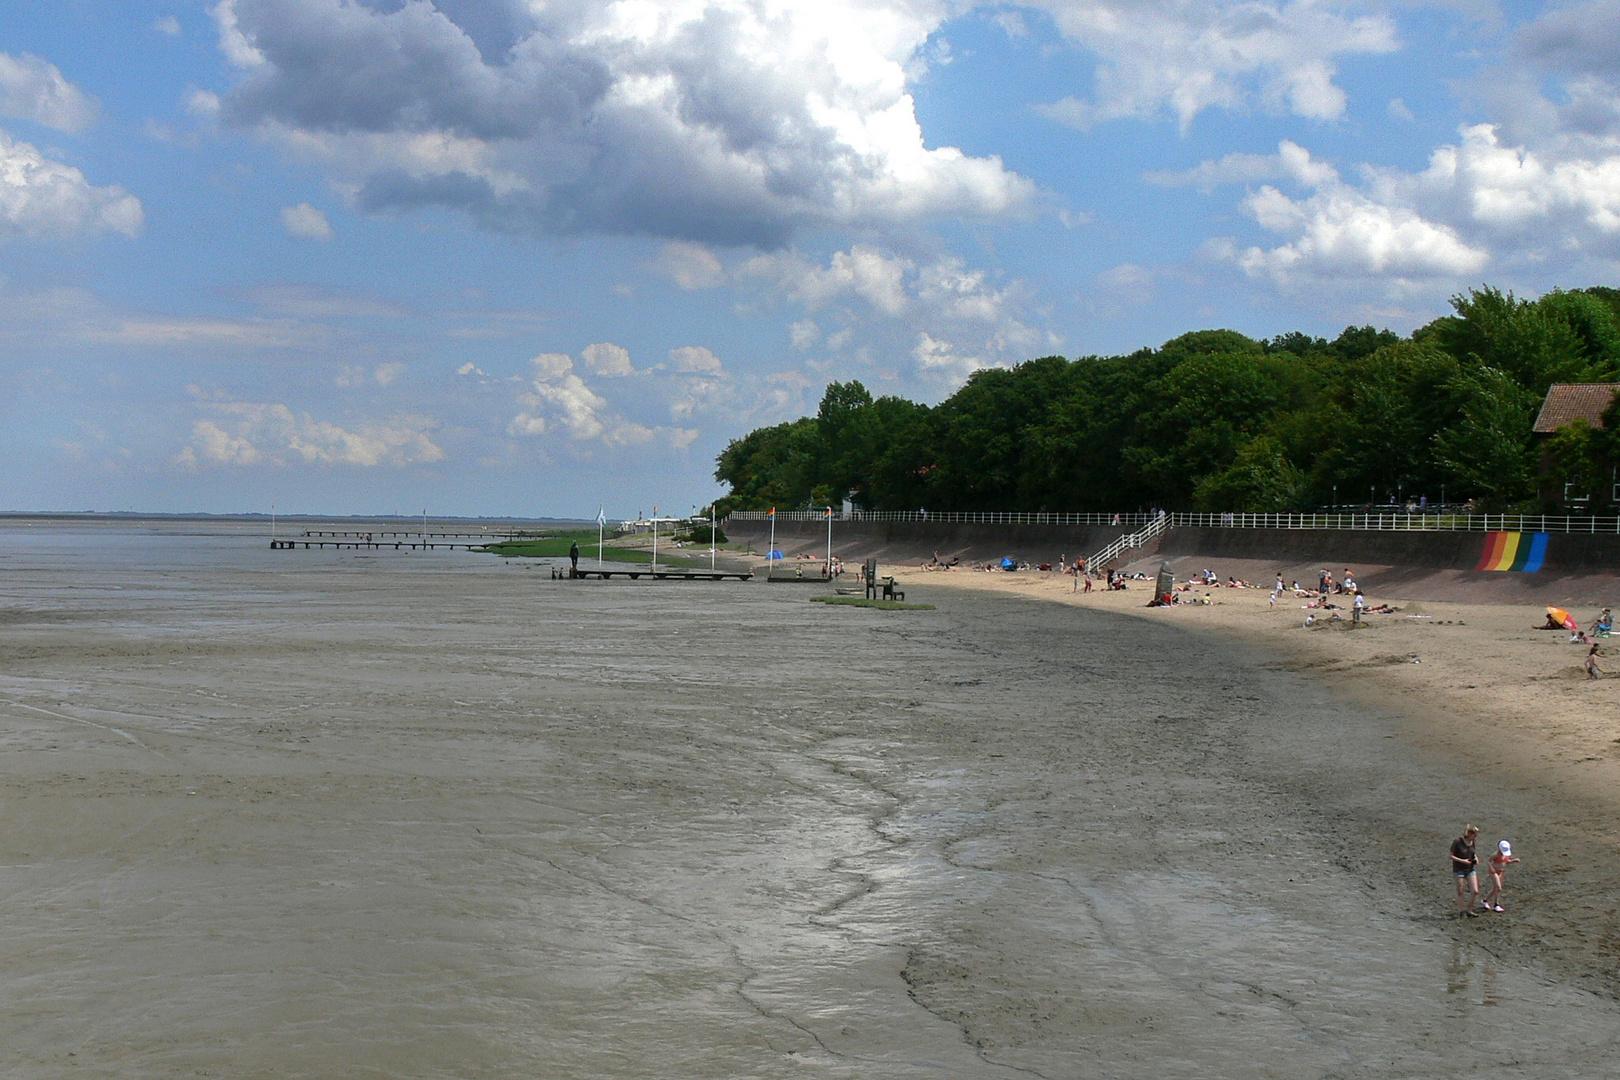 Dangast, Strand